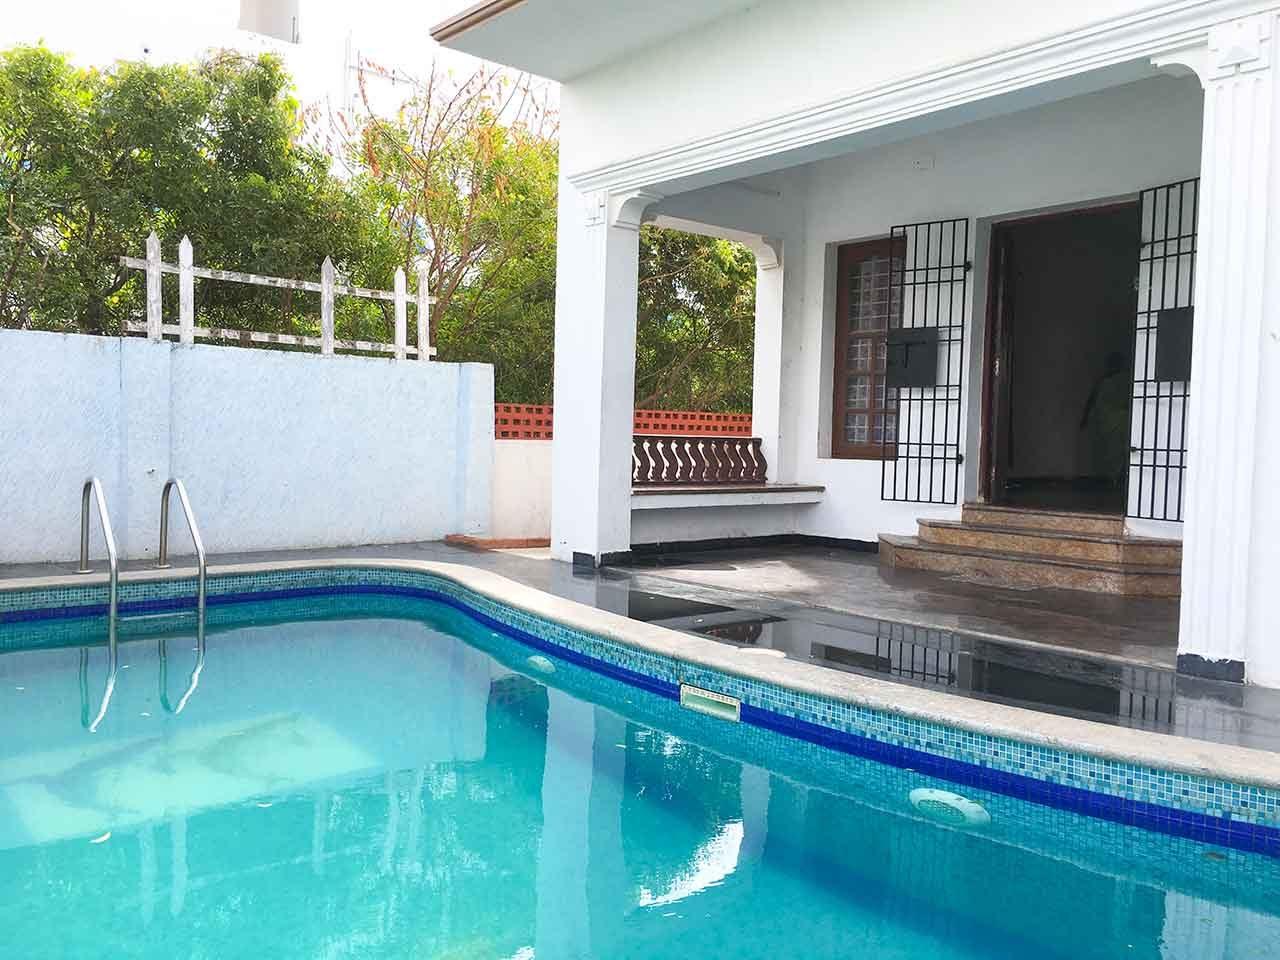 beach-house-for-rent-in-chennai